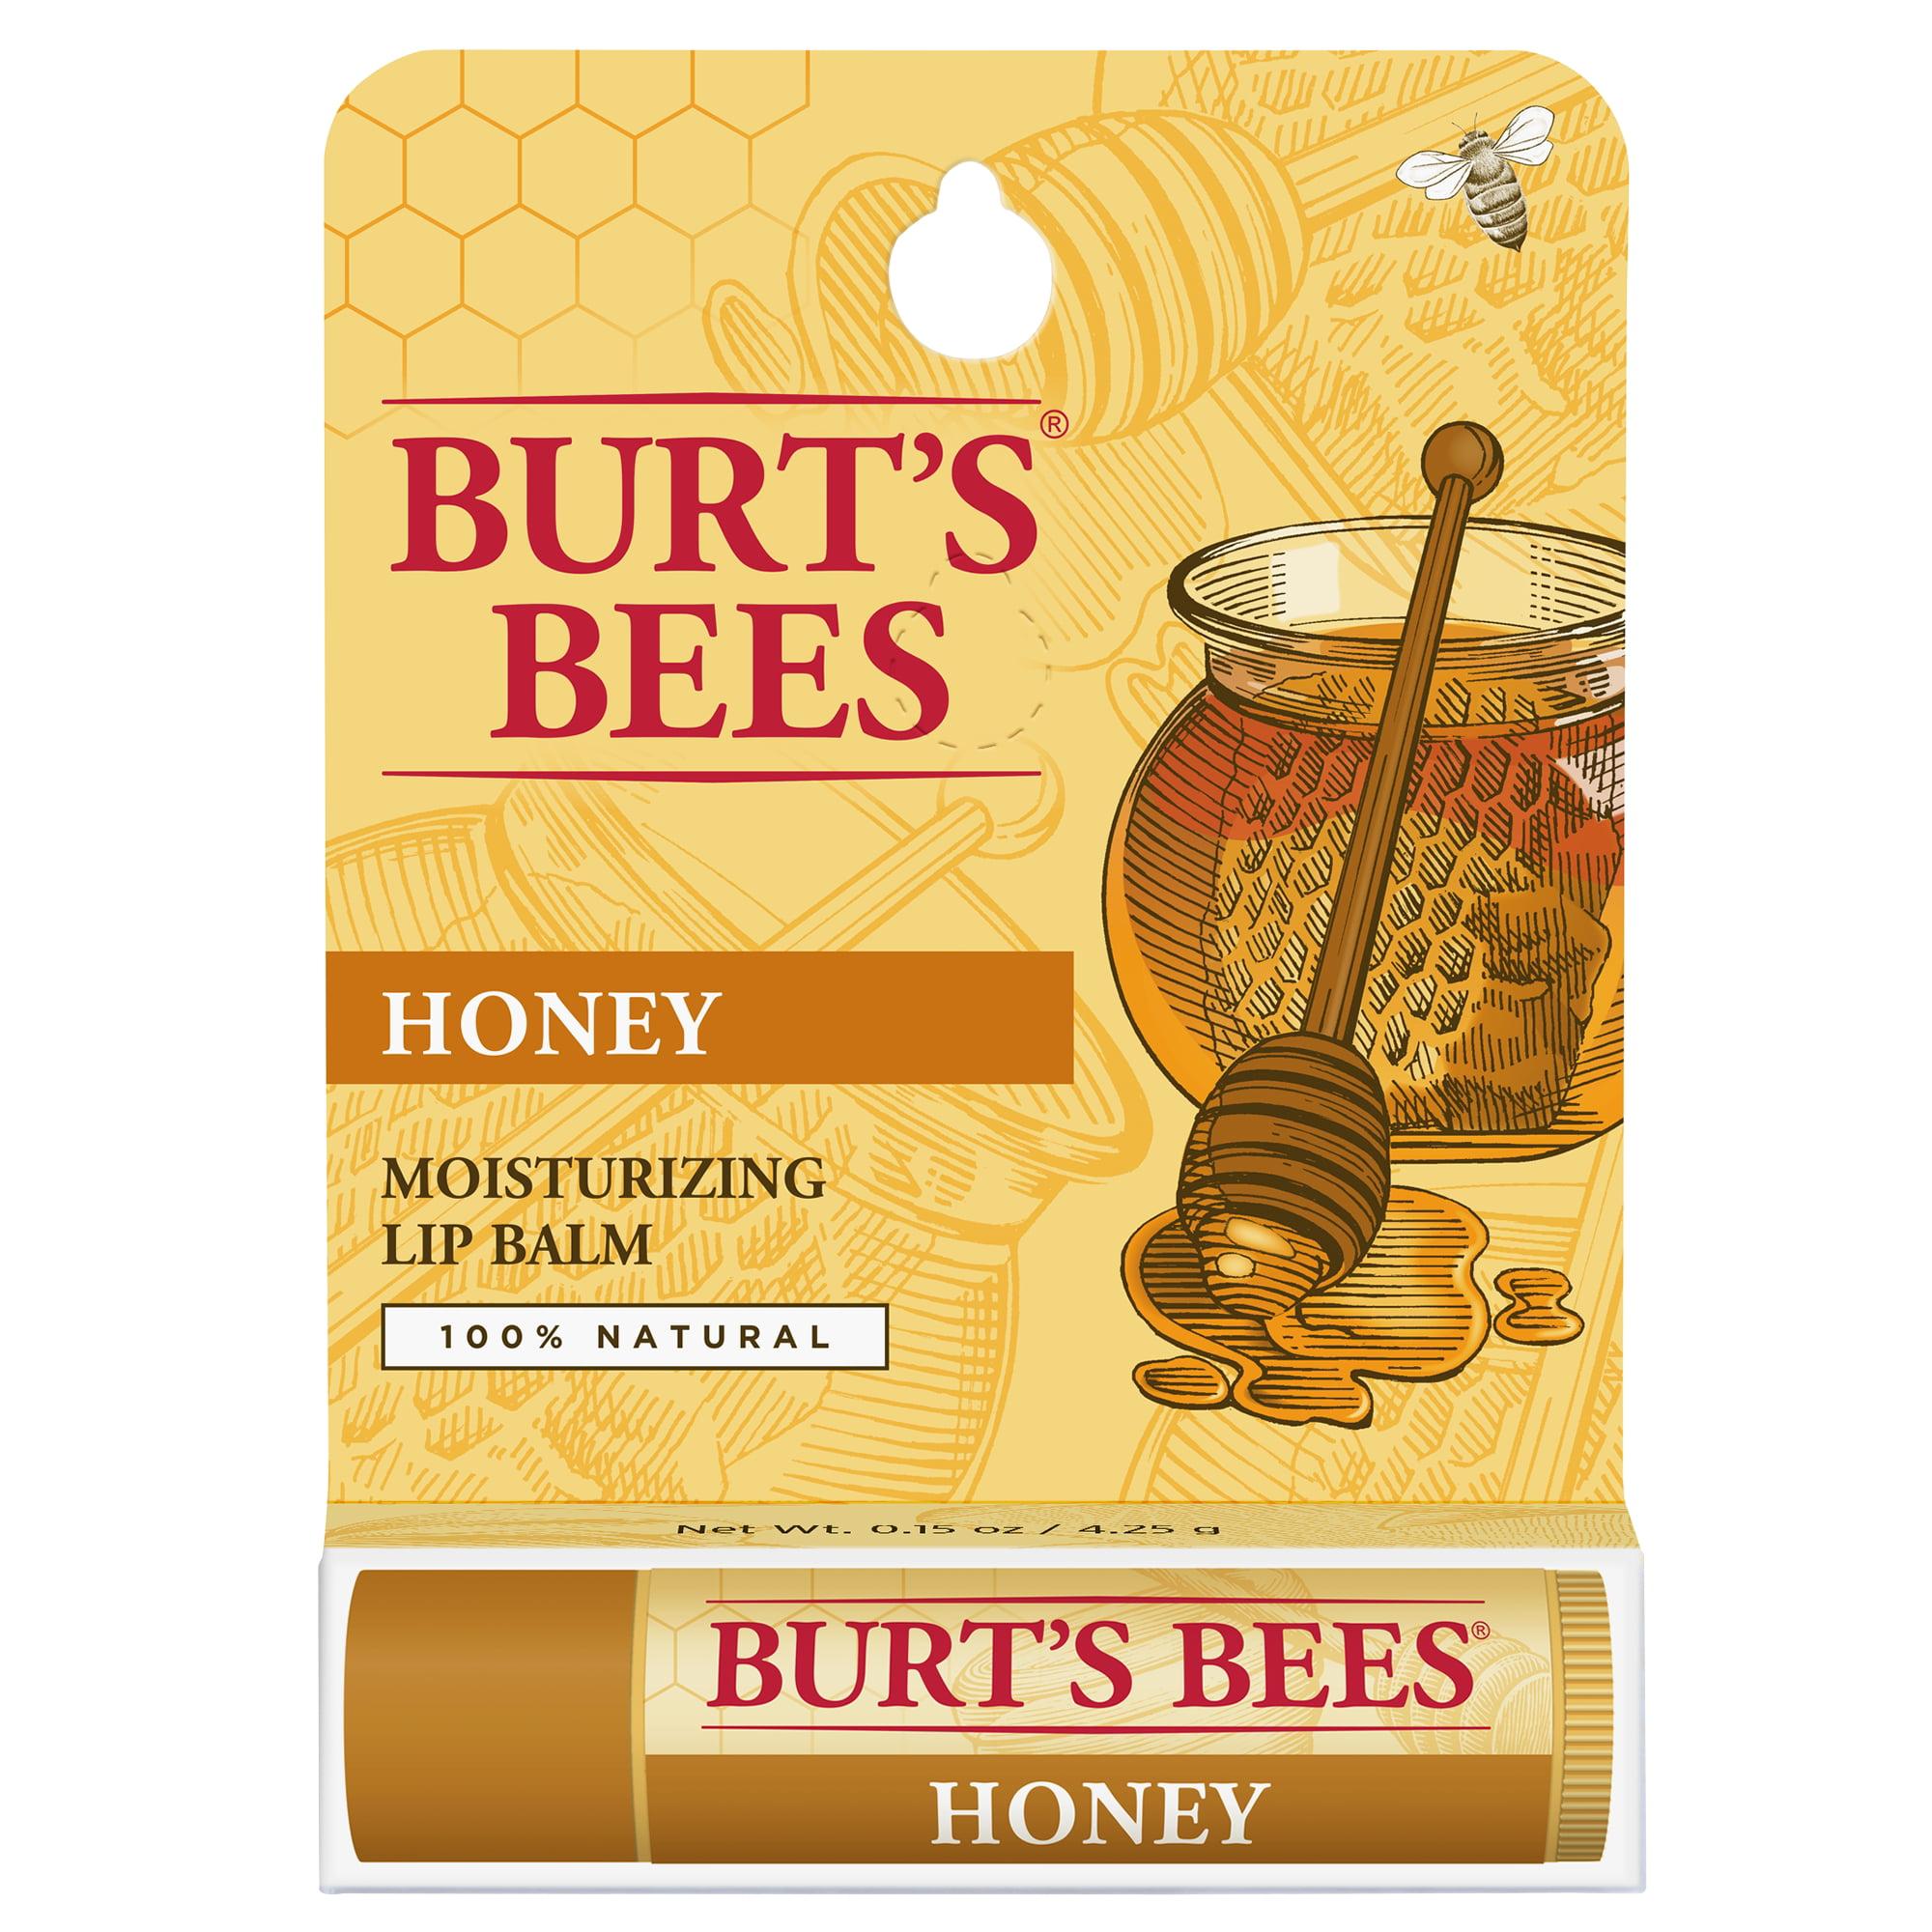 Burt's Bees Honey Moisturizing Lip Balm 0.15oz